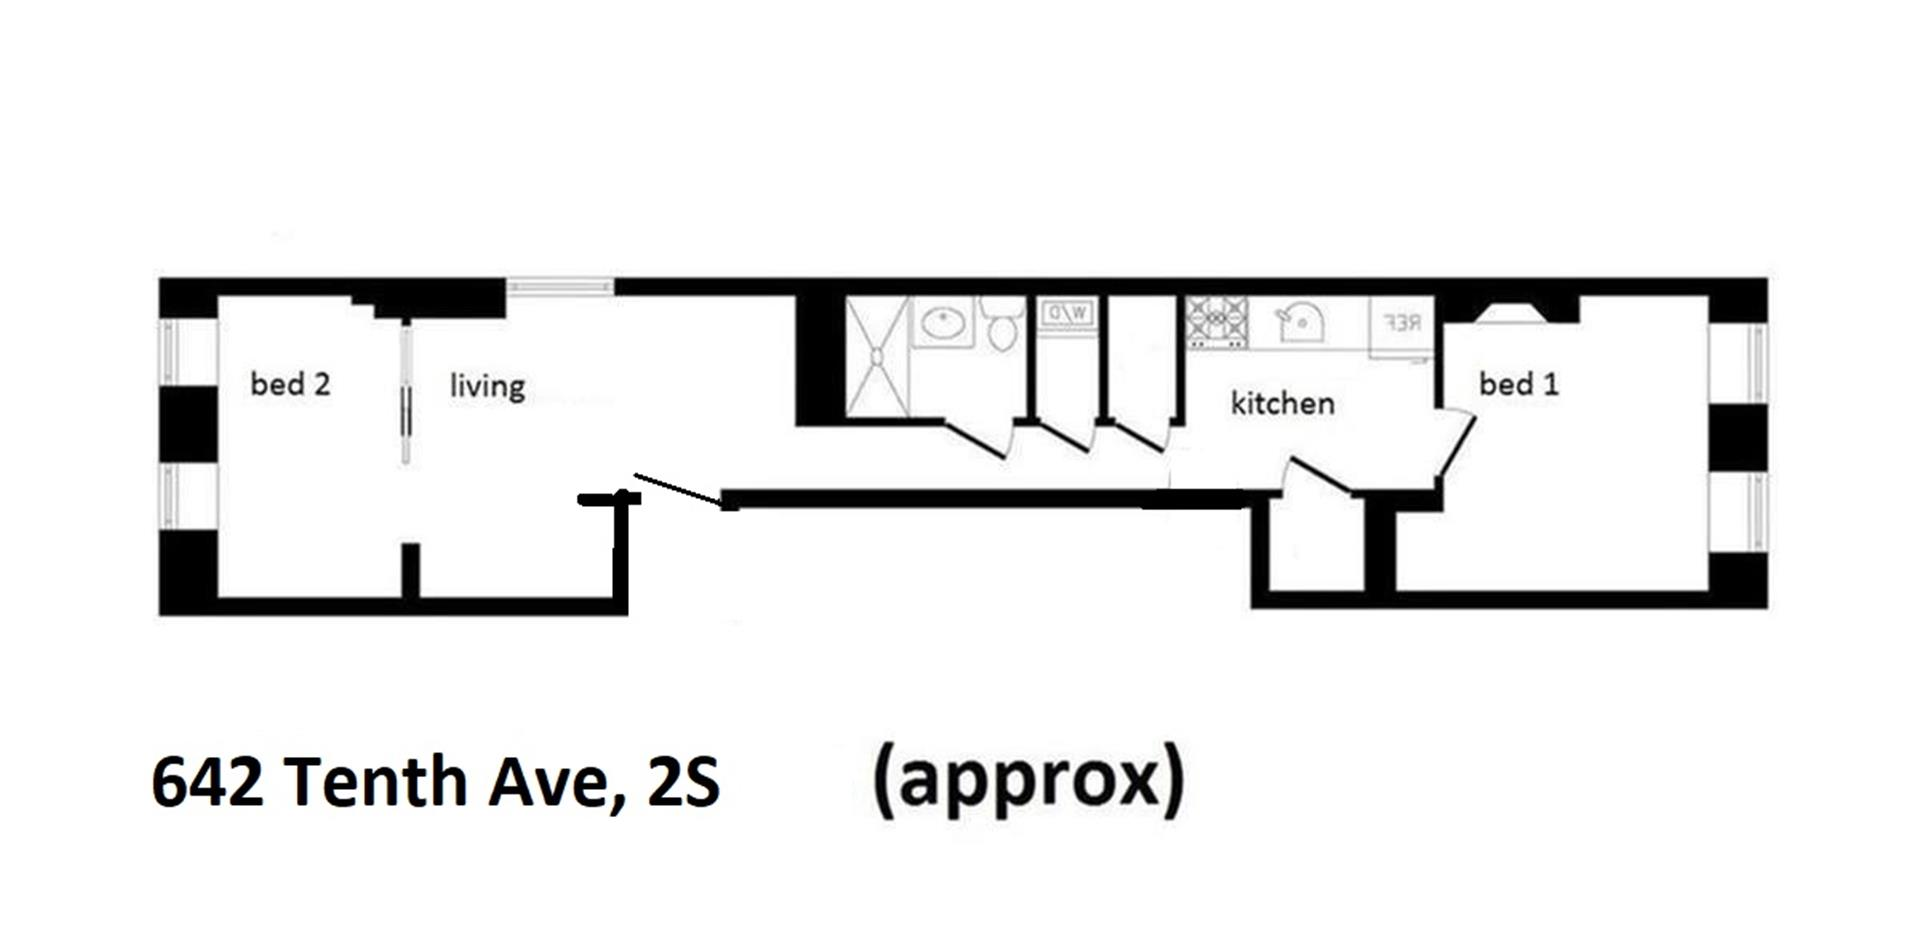 Floor plan of 642 Tenth Avenue, 2S - Clinton, New York